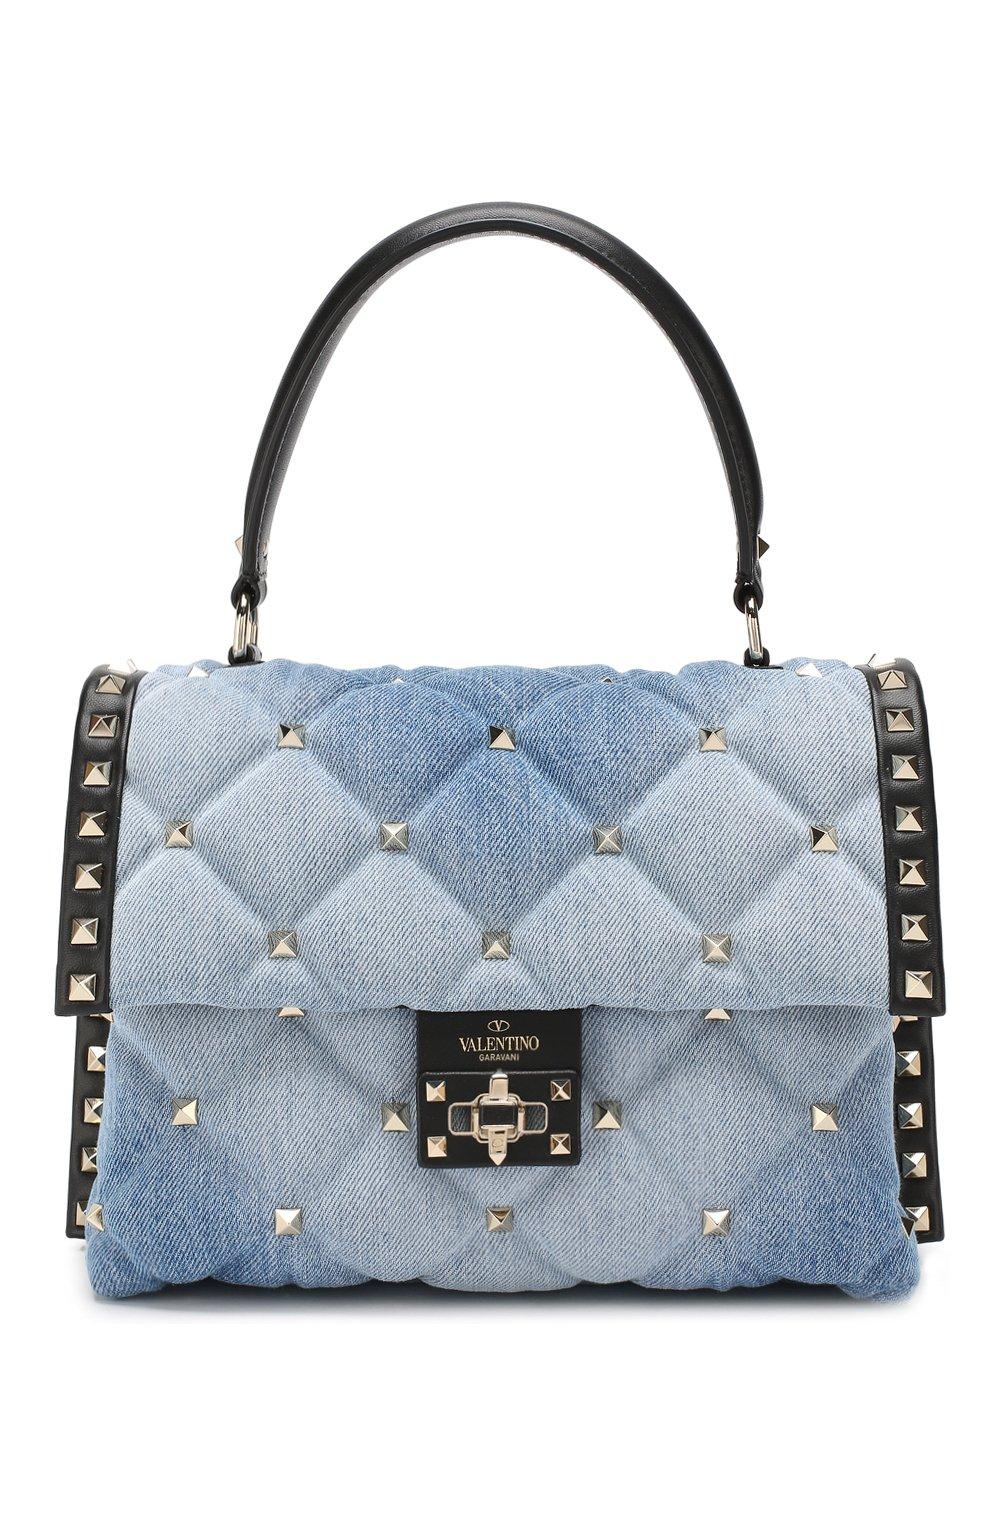 Сумка Valentino Garavani Candystud Valentino синяя цвета | Фото №1